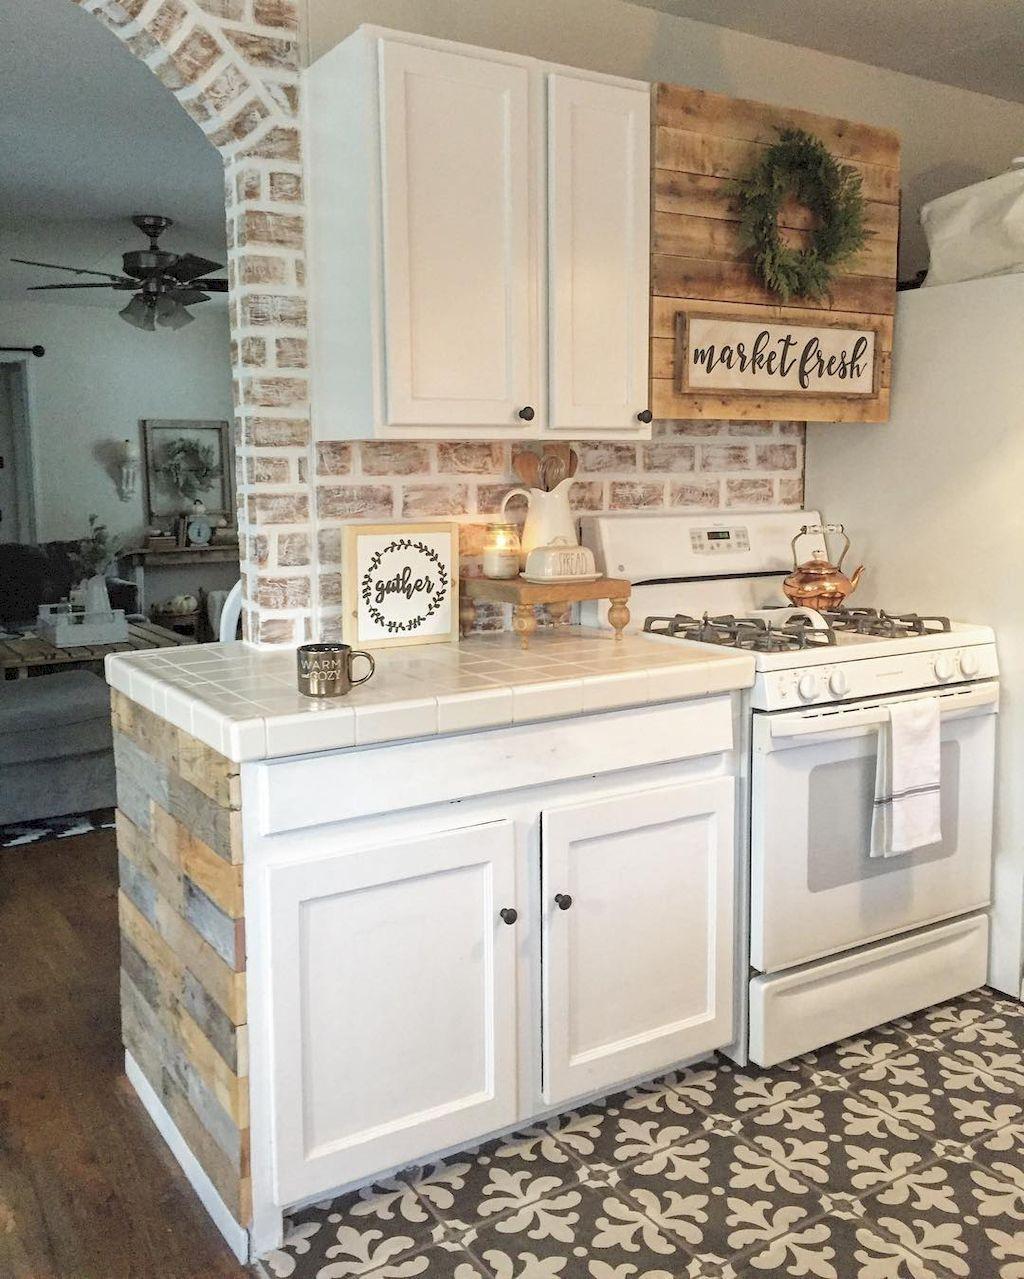 70 Tile Floor Farmhouse Kitchen Decor Ideas https